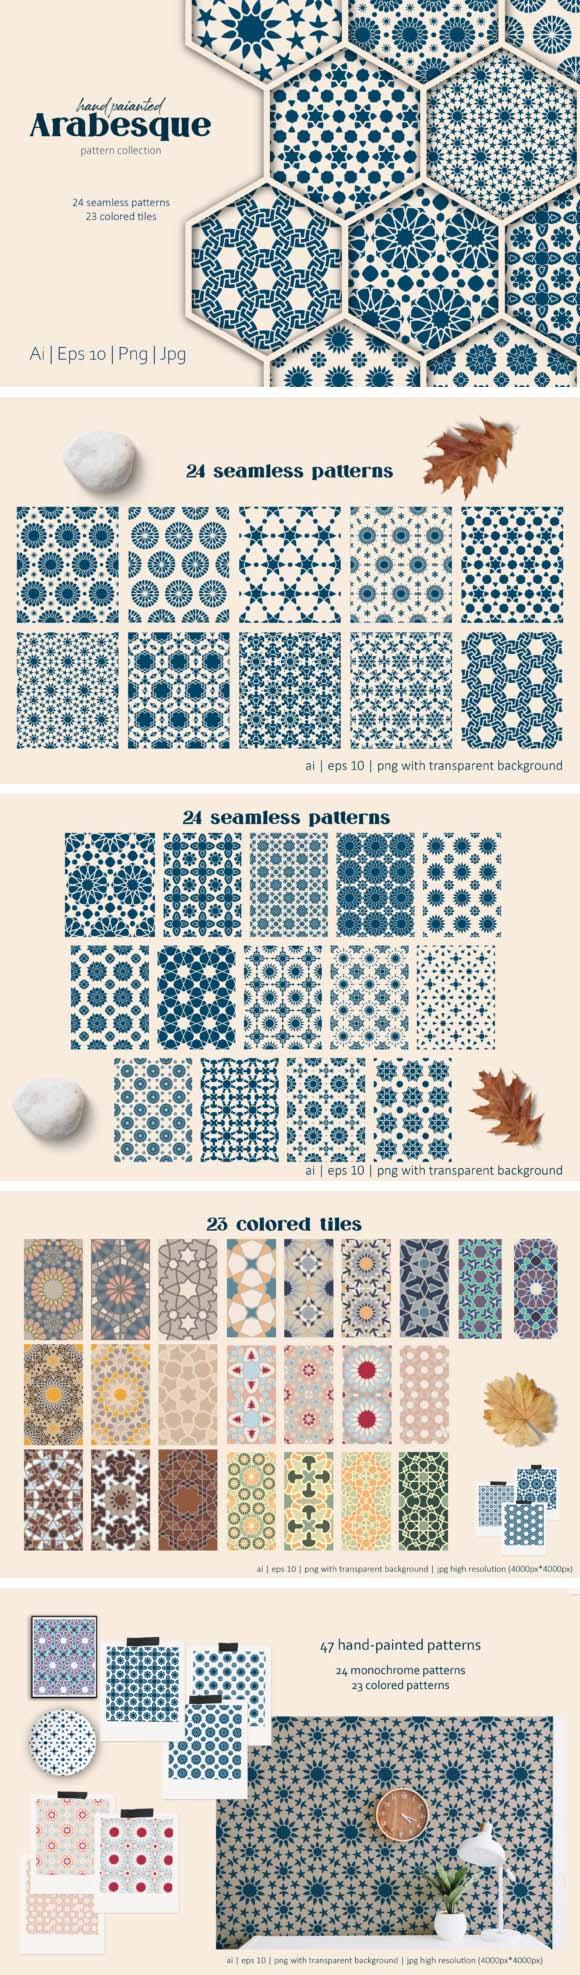 Arabesque Islamic Art Patterns